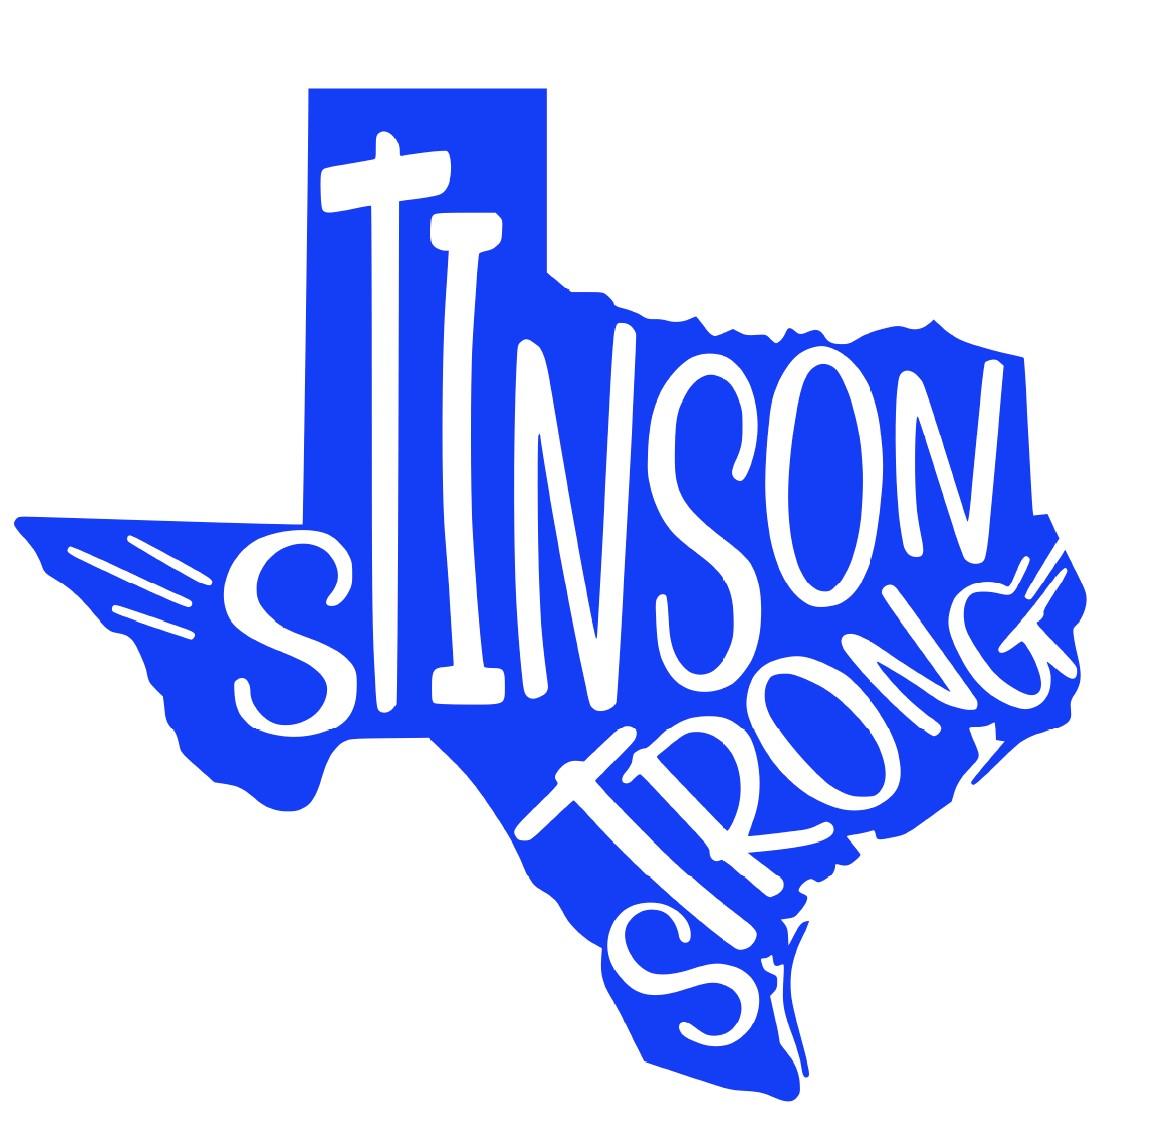 Stinson Strong